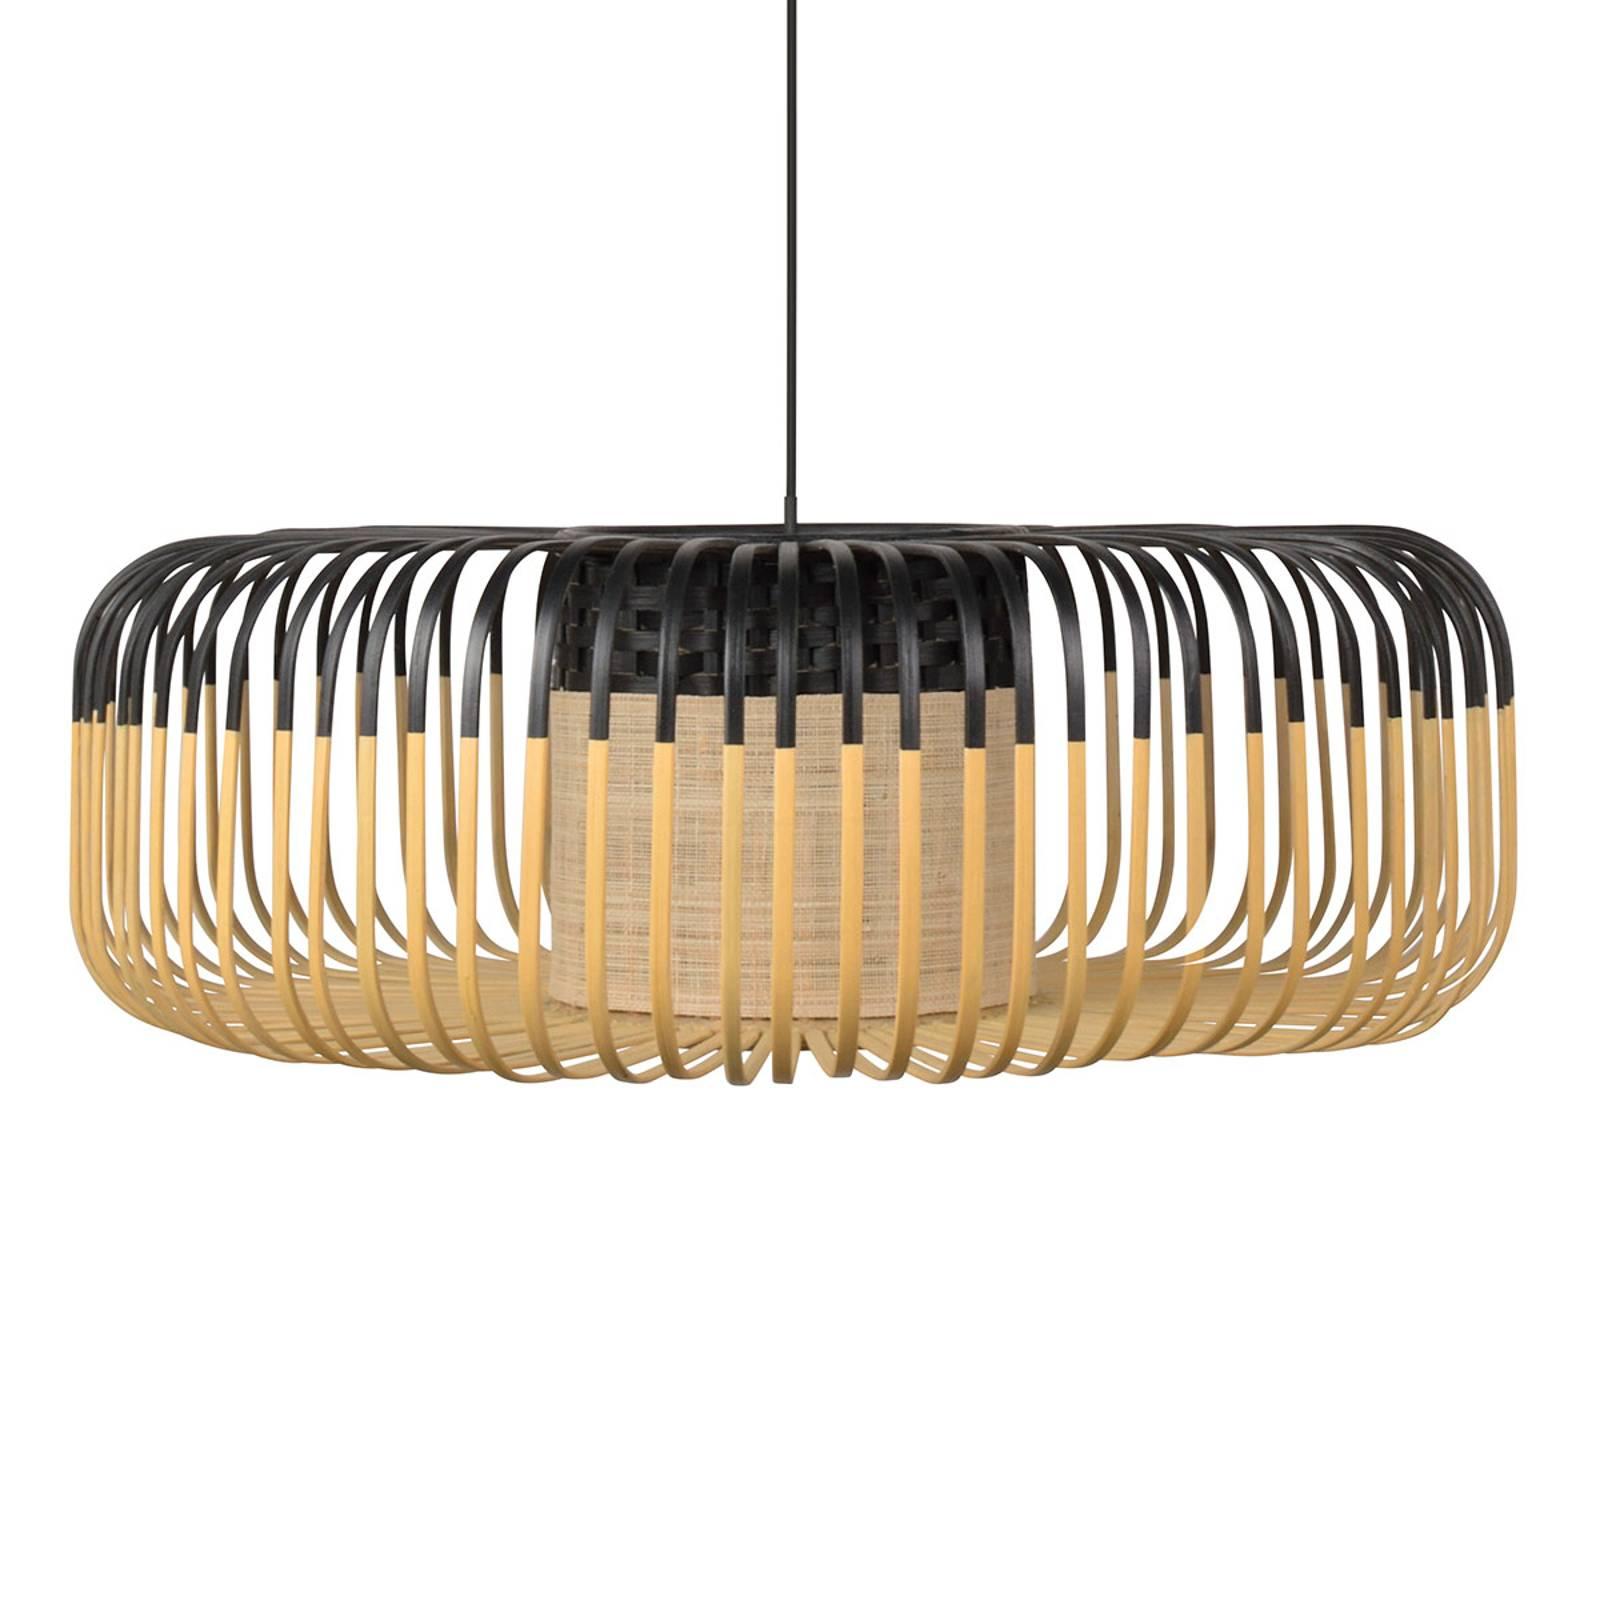 Forestier Bamboo Light XL -riippuvalo 60 cm musta